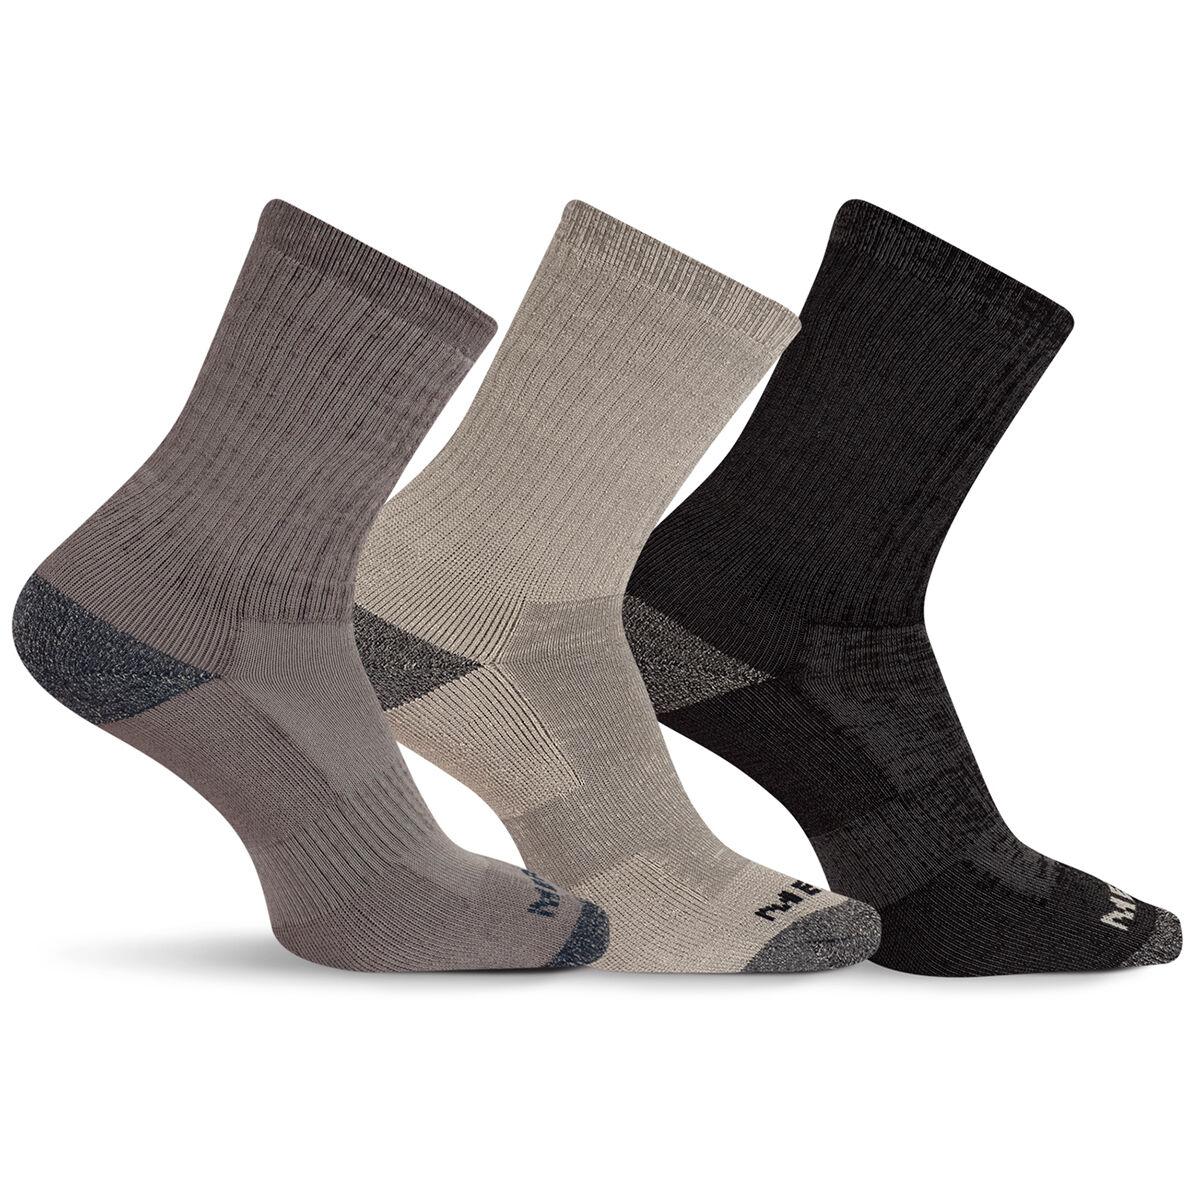 Merrell Men's Cushioned Crew-Length Performance Hiker Socks, 3-Pack - Black, L/XL